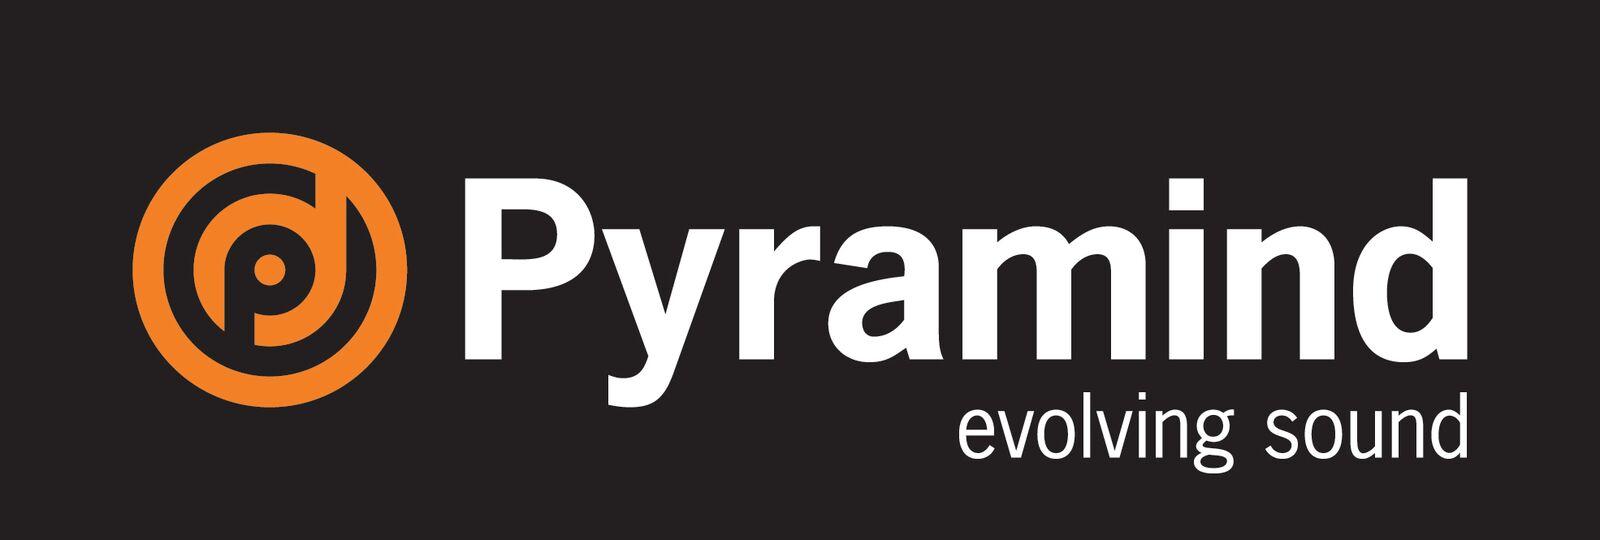 Pyramind 2.jpeg